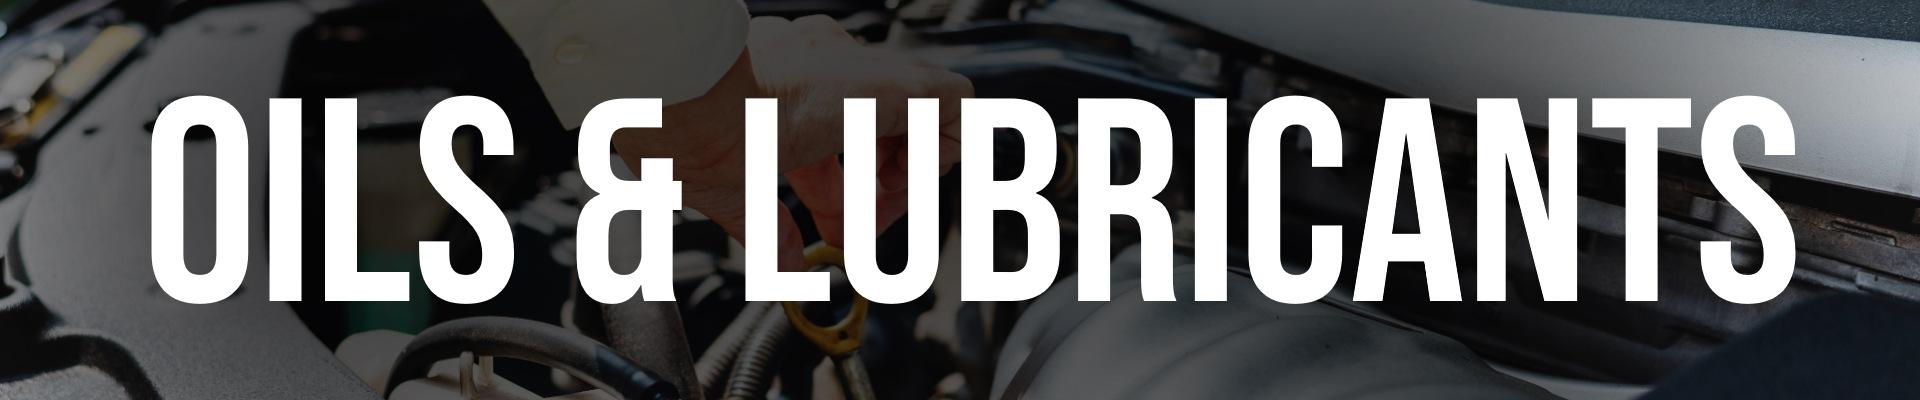 Oils & Lubricants Banner